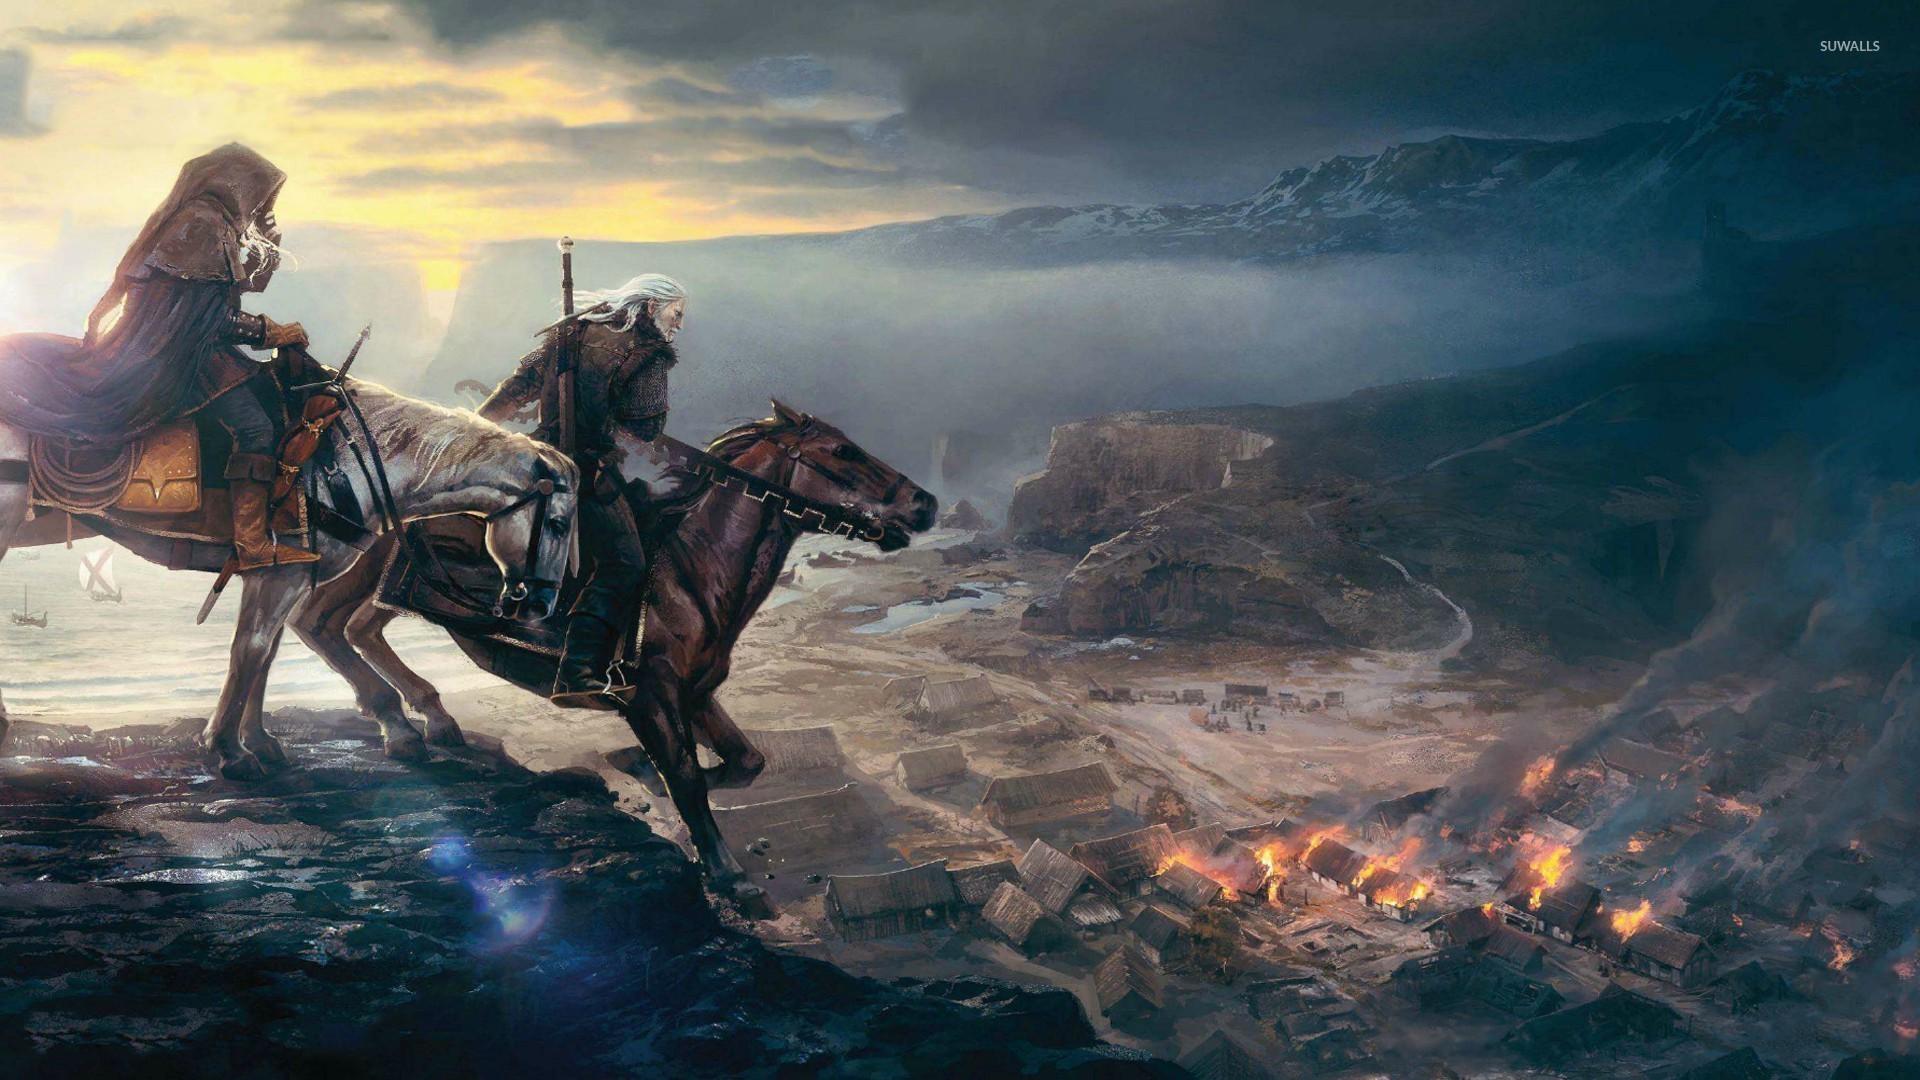 Witcher 3 Wallpaper – WallpaperSafari